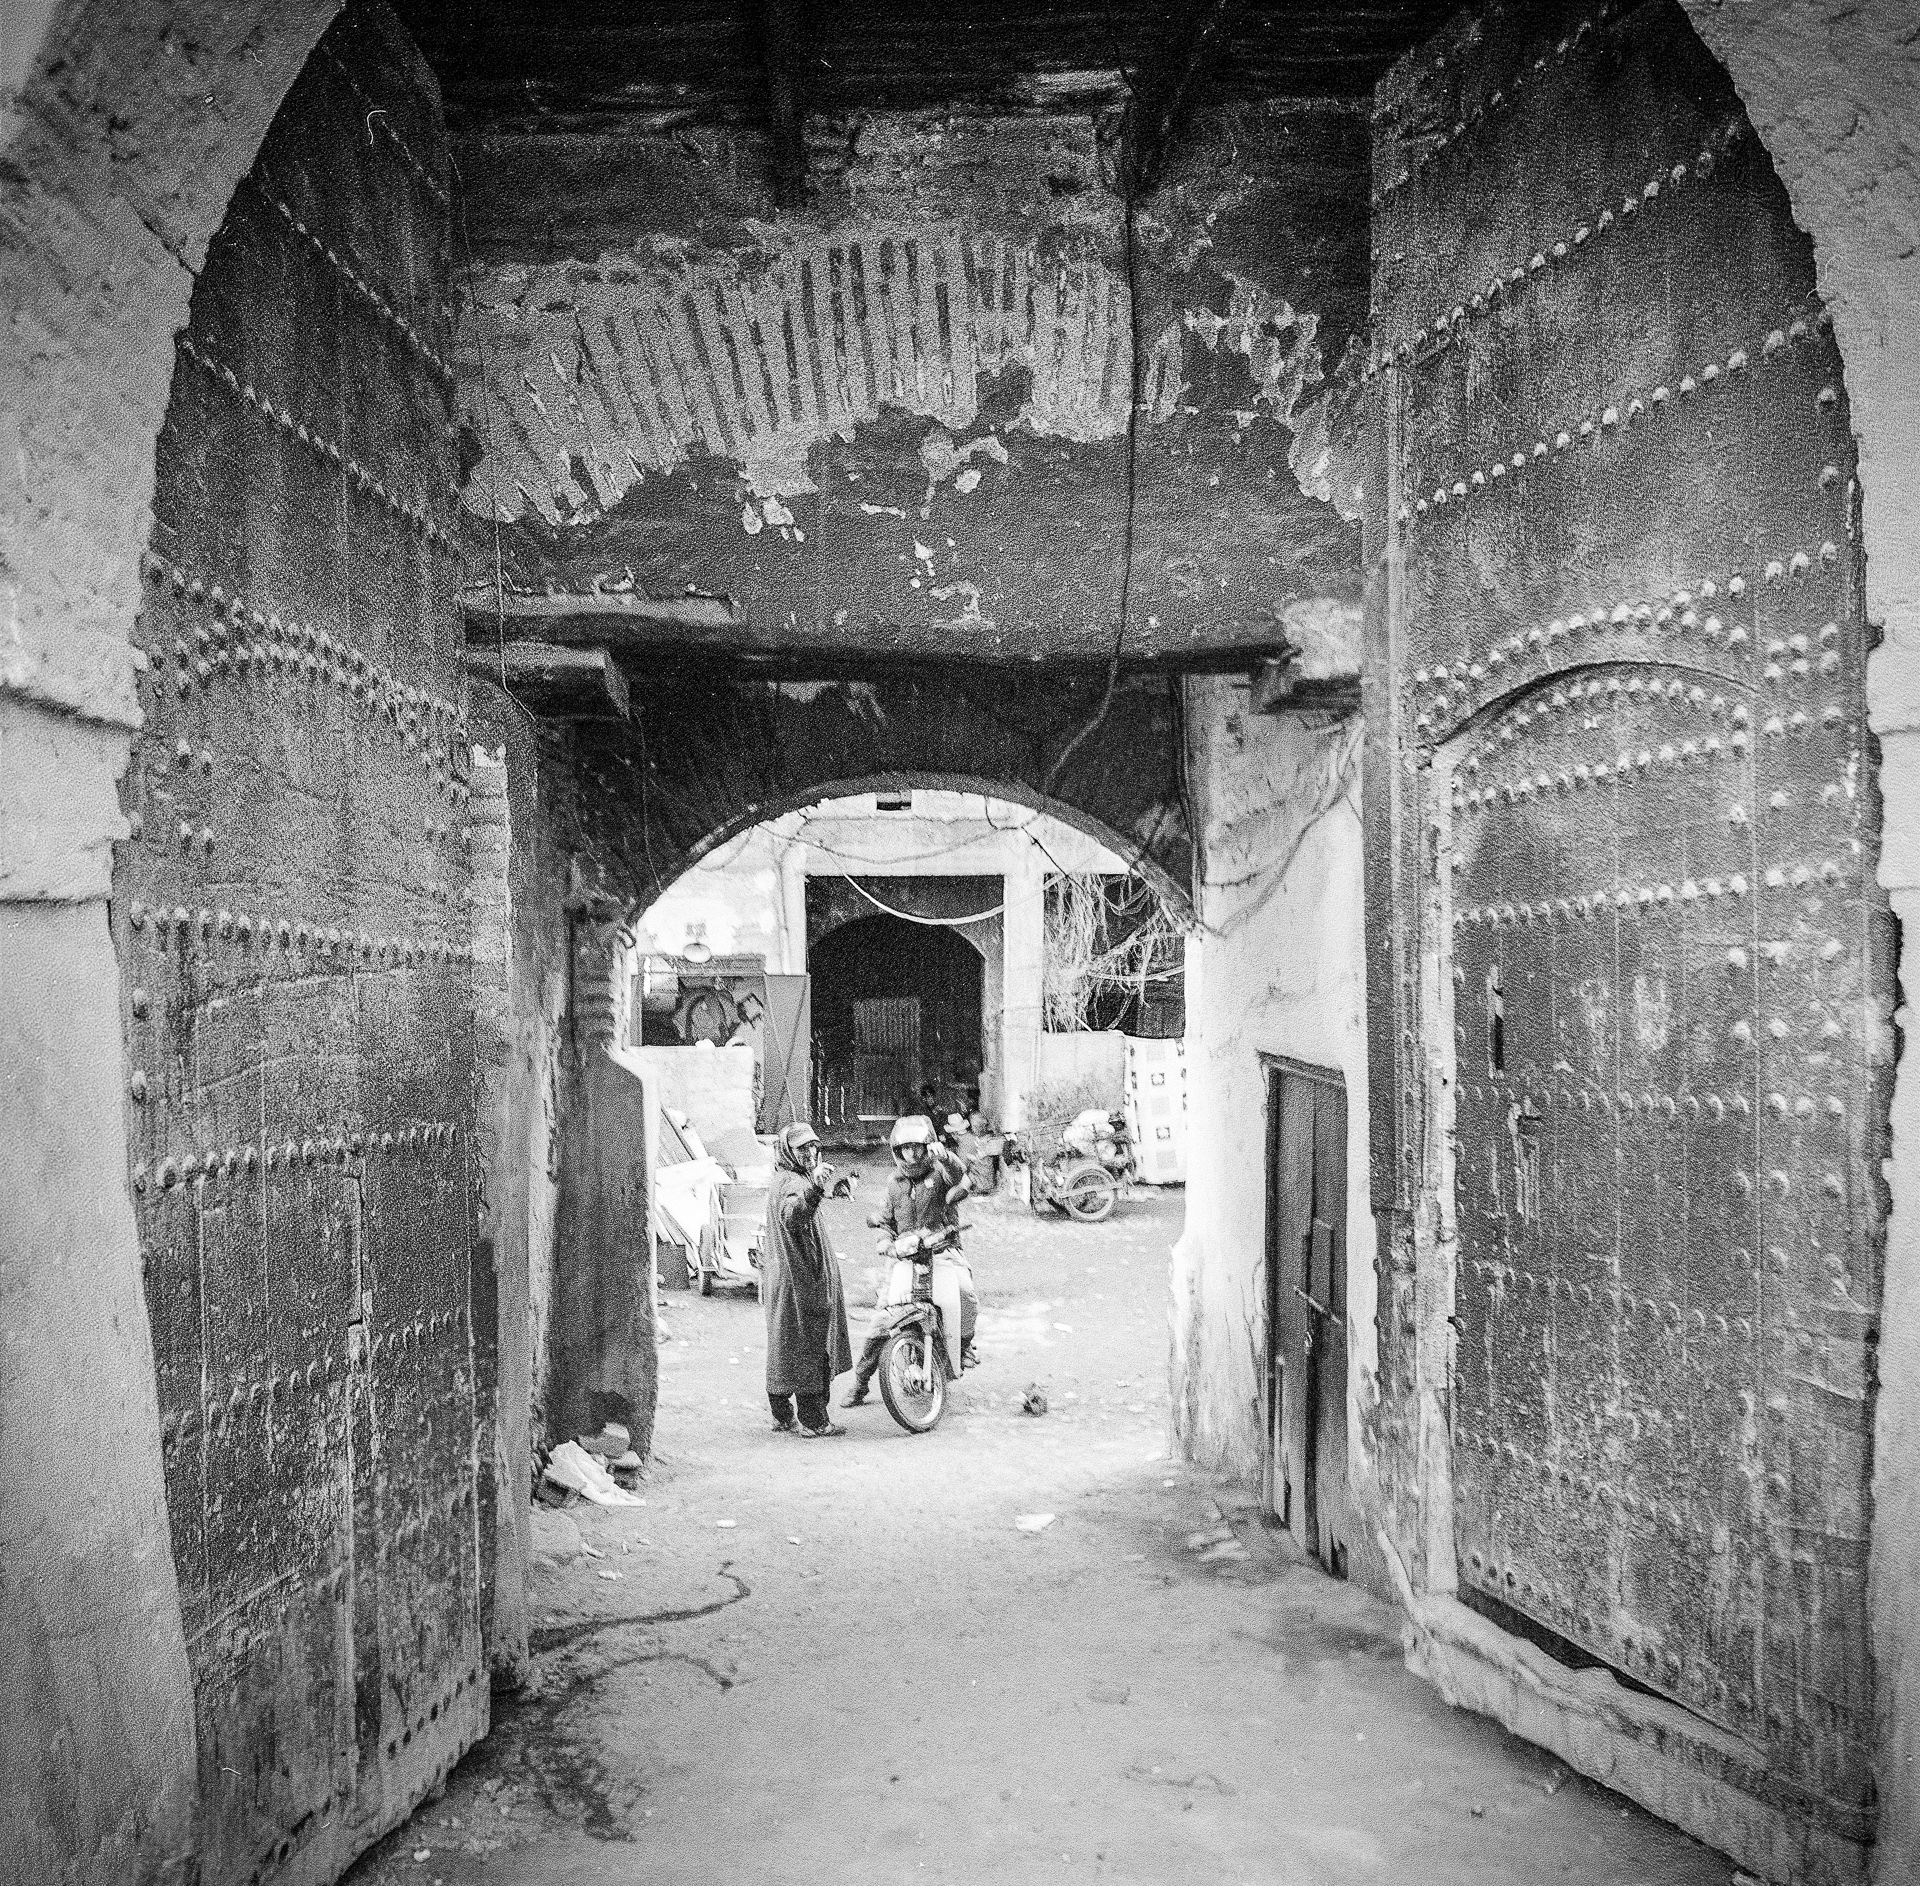 2014-01-30_Roll_05_Marrakech_RAW_03-Edit.jpg